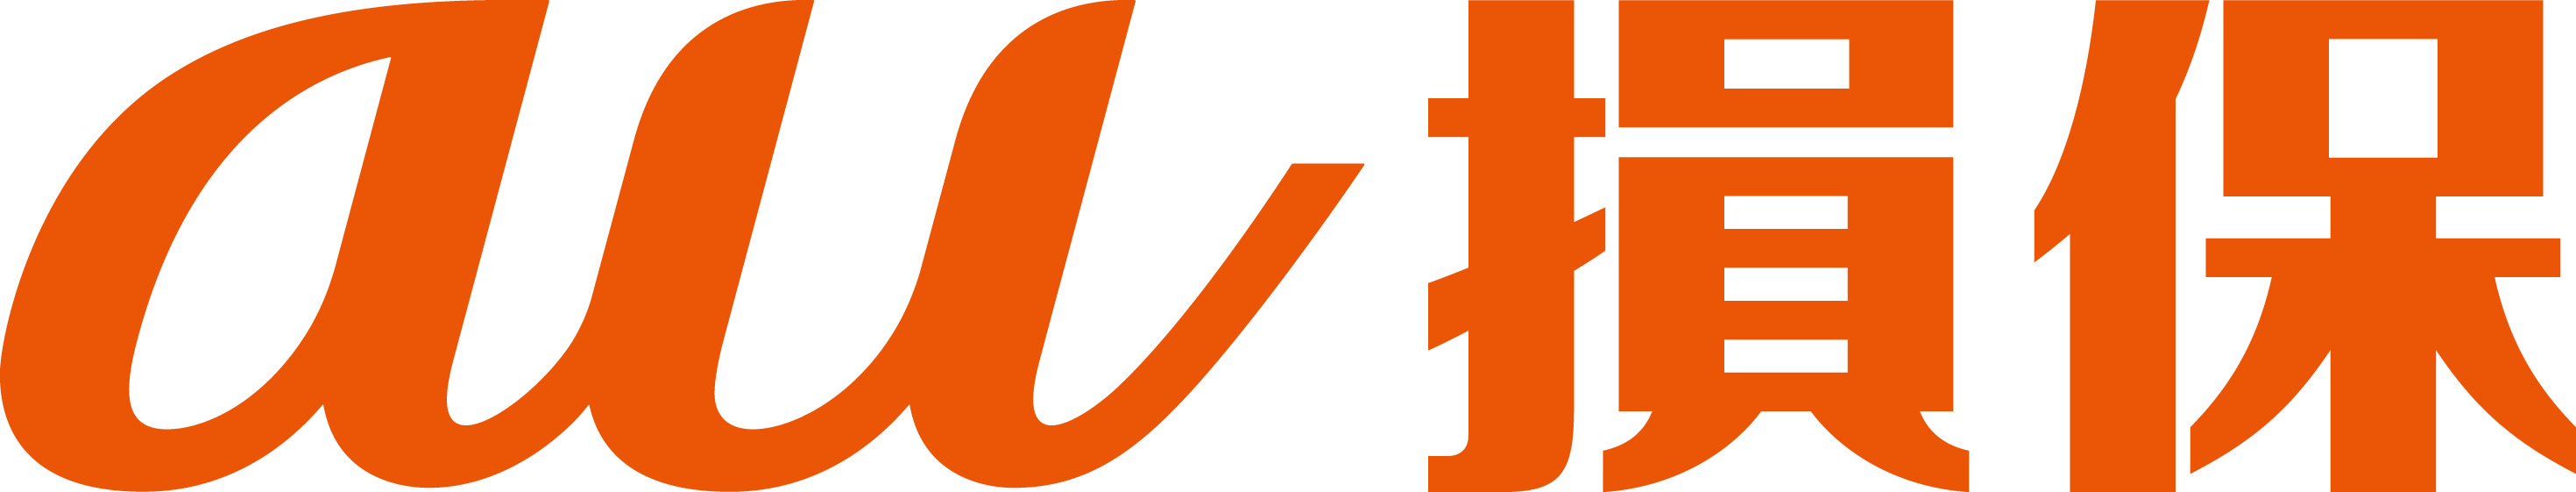 【au損害保険株式会社】 au損保キャンペーン「『自転車向 け保険』に新規加入で、人気賞品が当たる!」開始